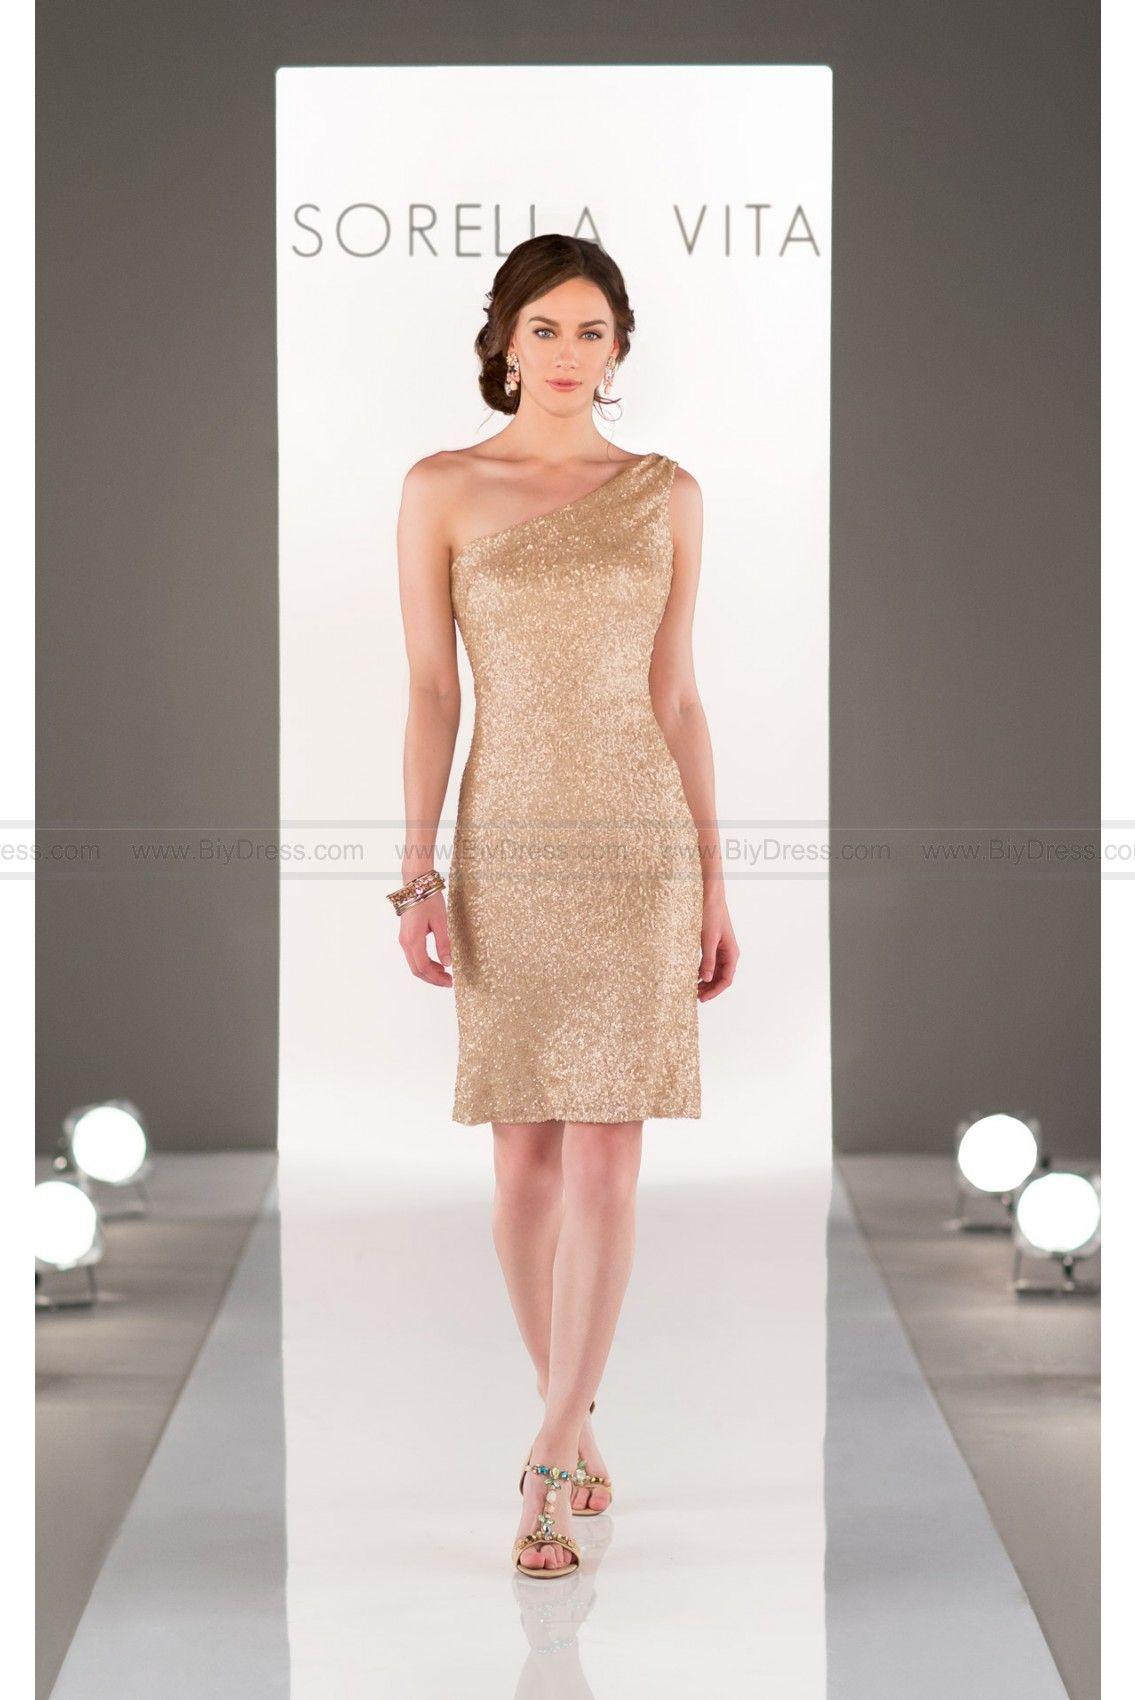 Httpbiydresssorella vita one shoulder sequin sorella vita one shoulder sequin bridesmaid dress style 8725 ombrellifo Choice Image